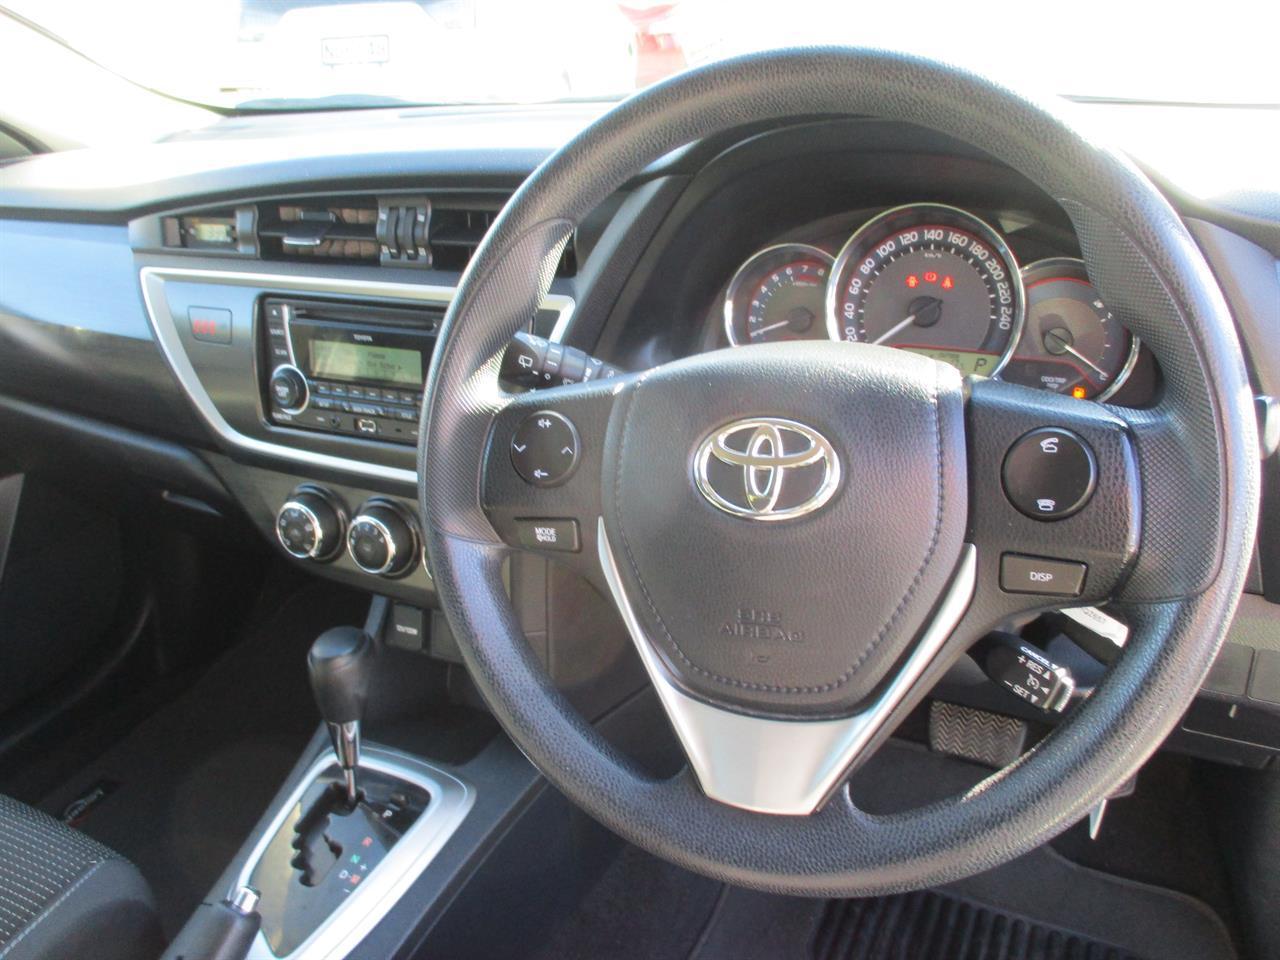 image-15, 2014 Toyota Corolla GX 1.8P HATCH CV at Dunedin